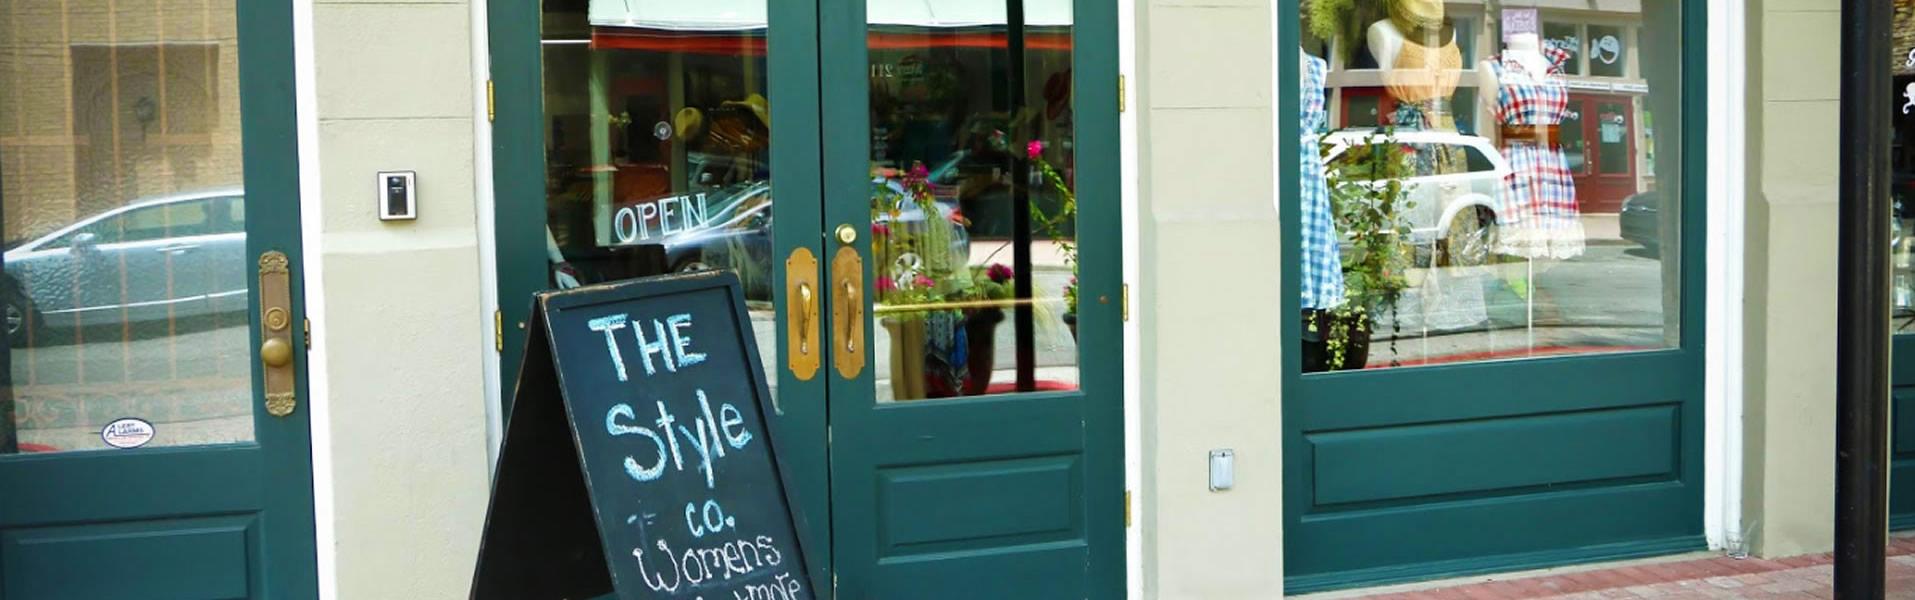 Style Co. Front-Door, Galveston TX